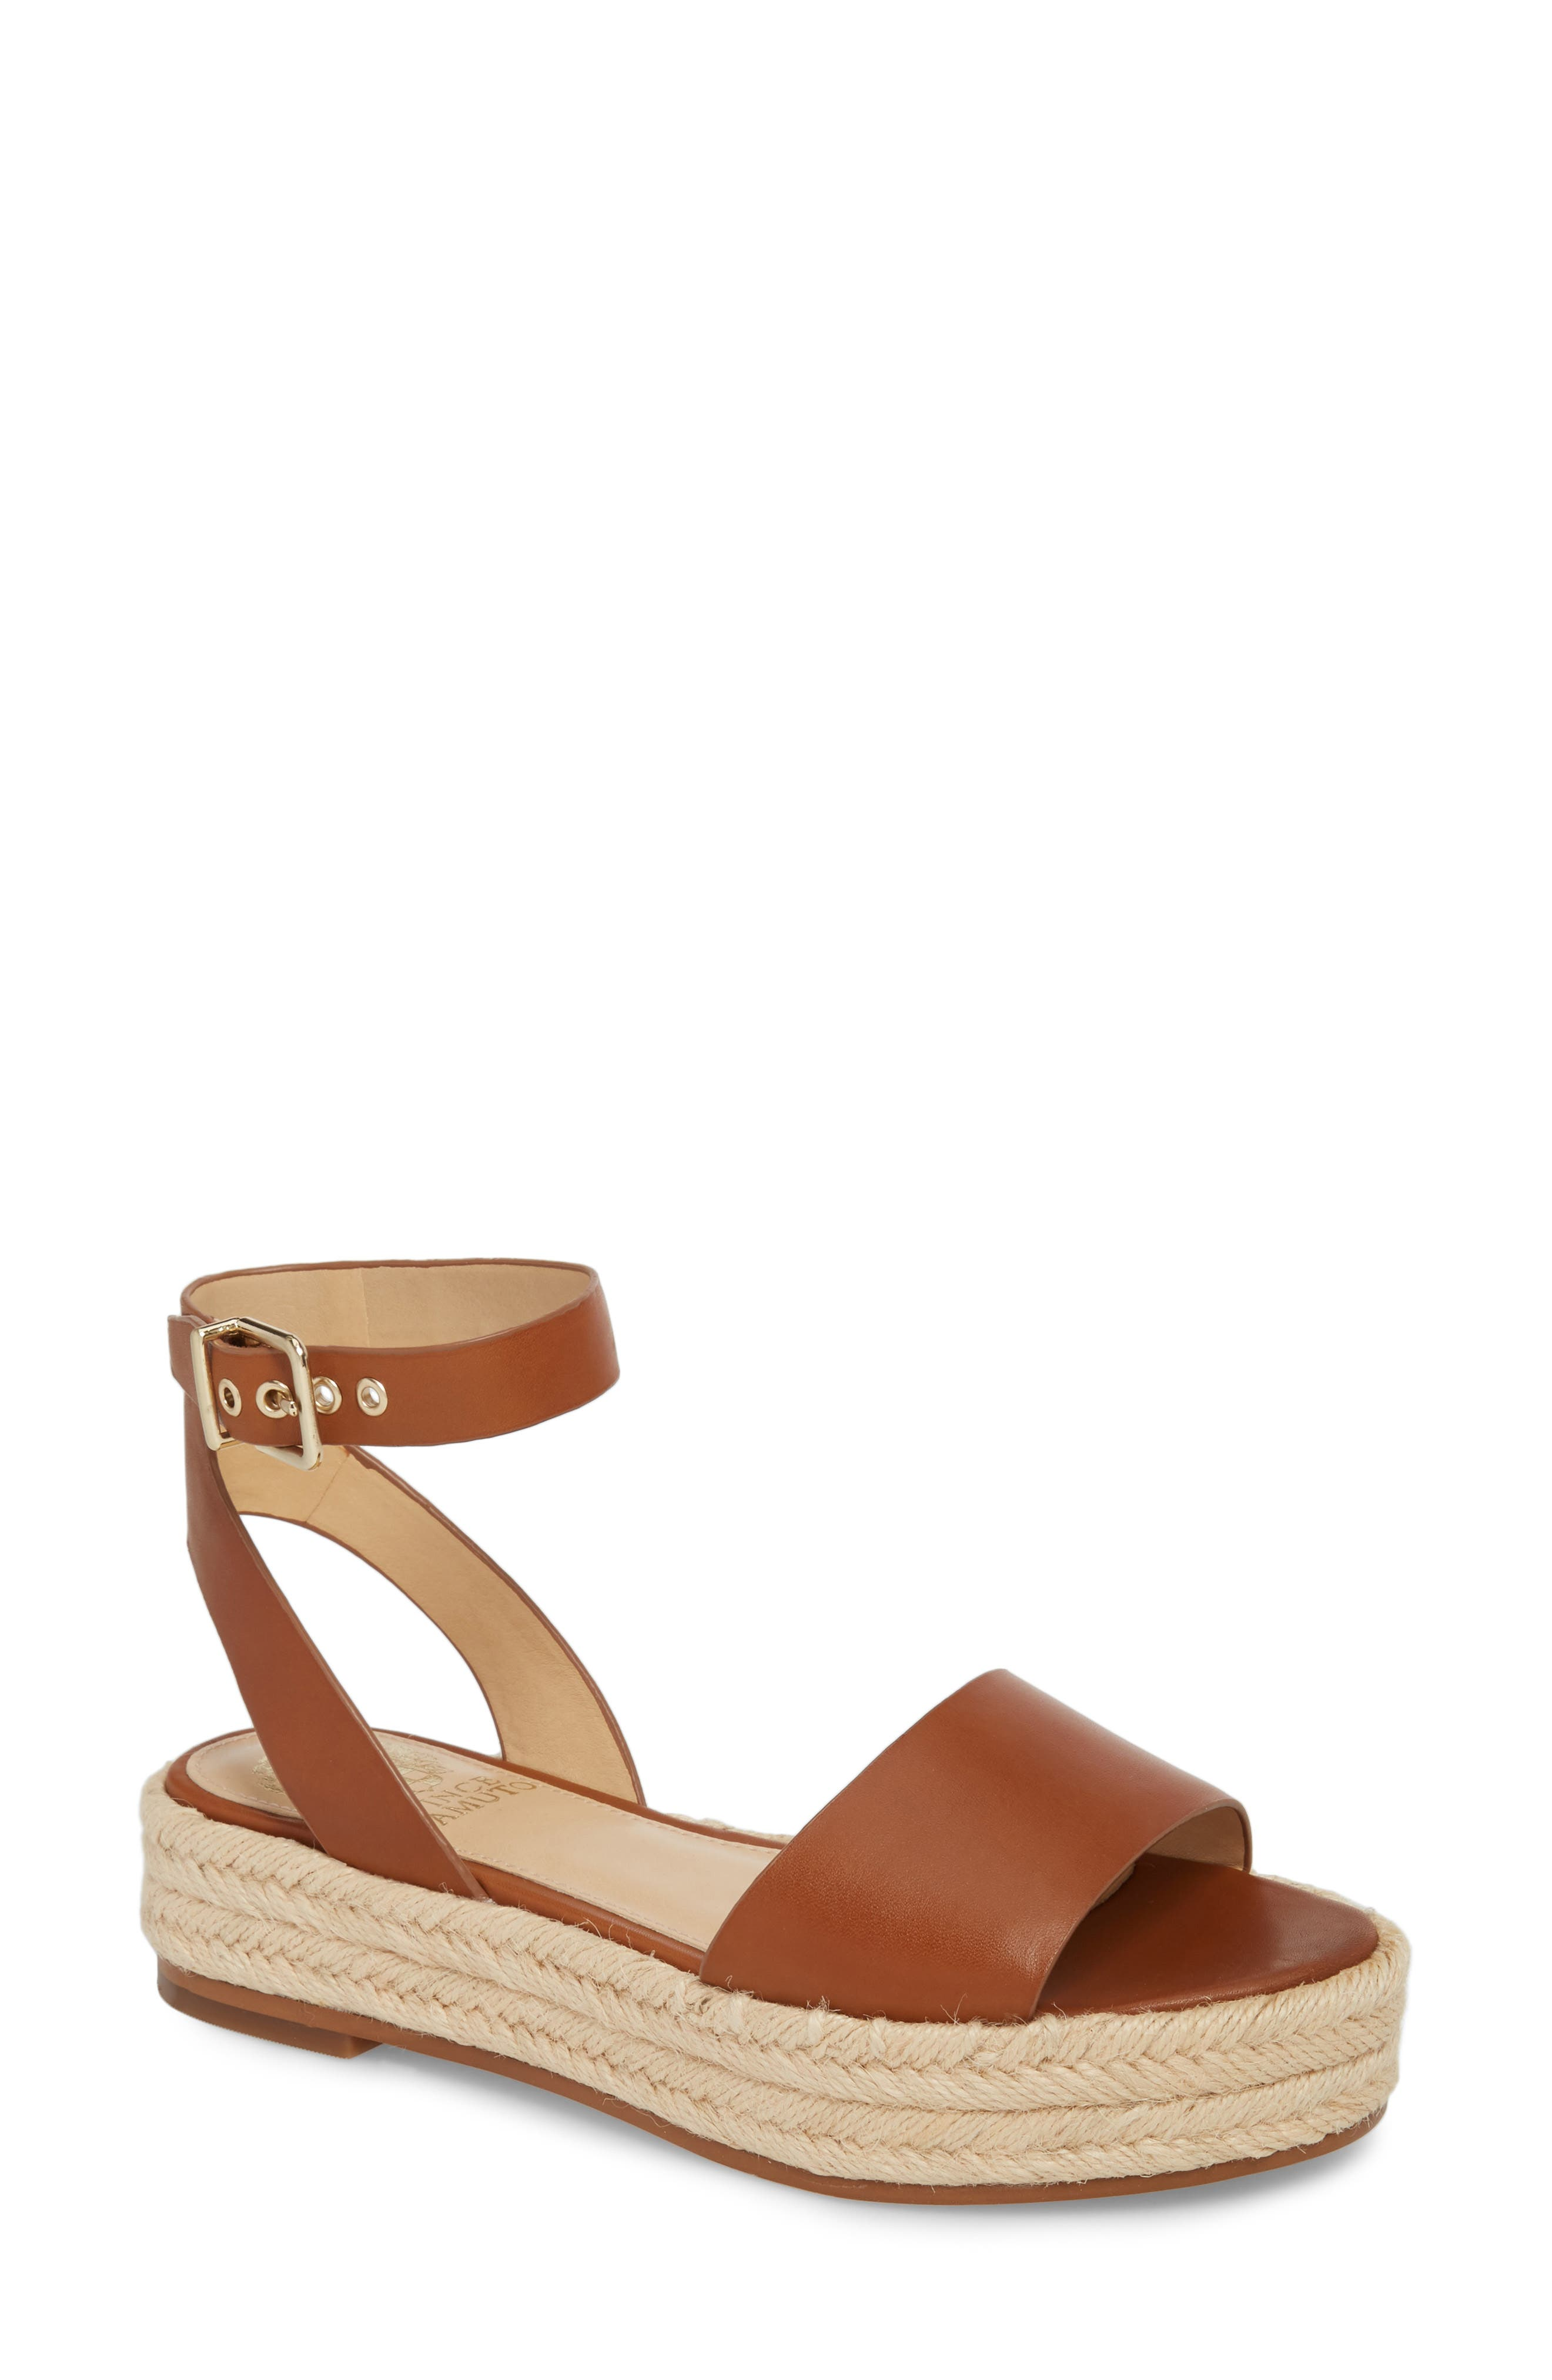 Kathalia Platform Sandal, Main, color, SUMMER COGNAC LEATHER